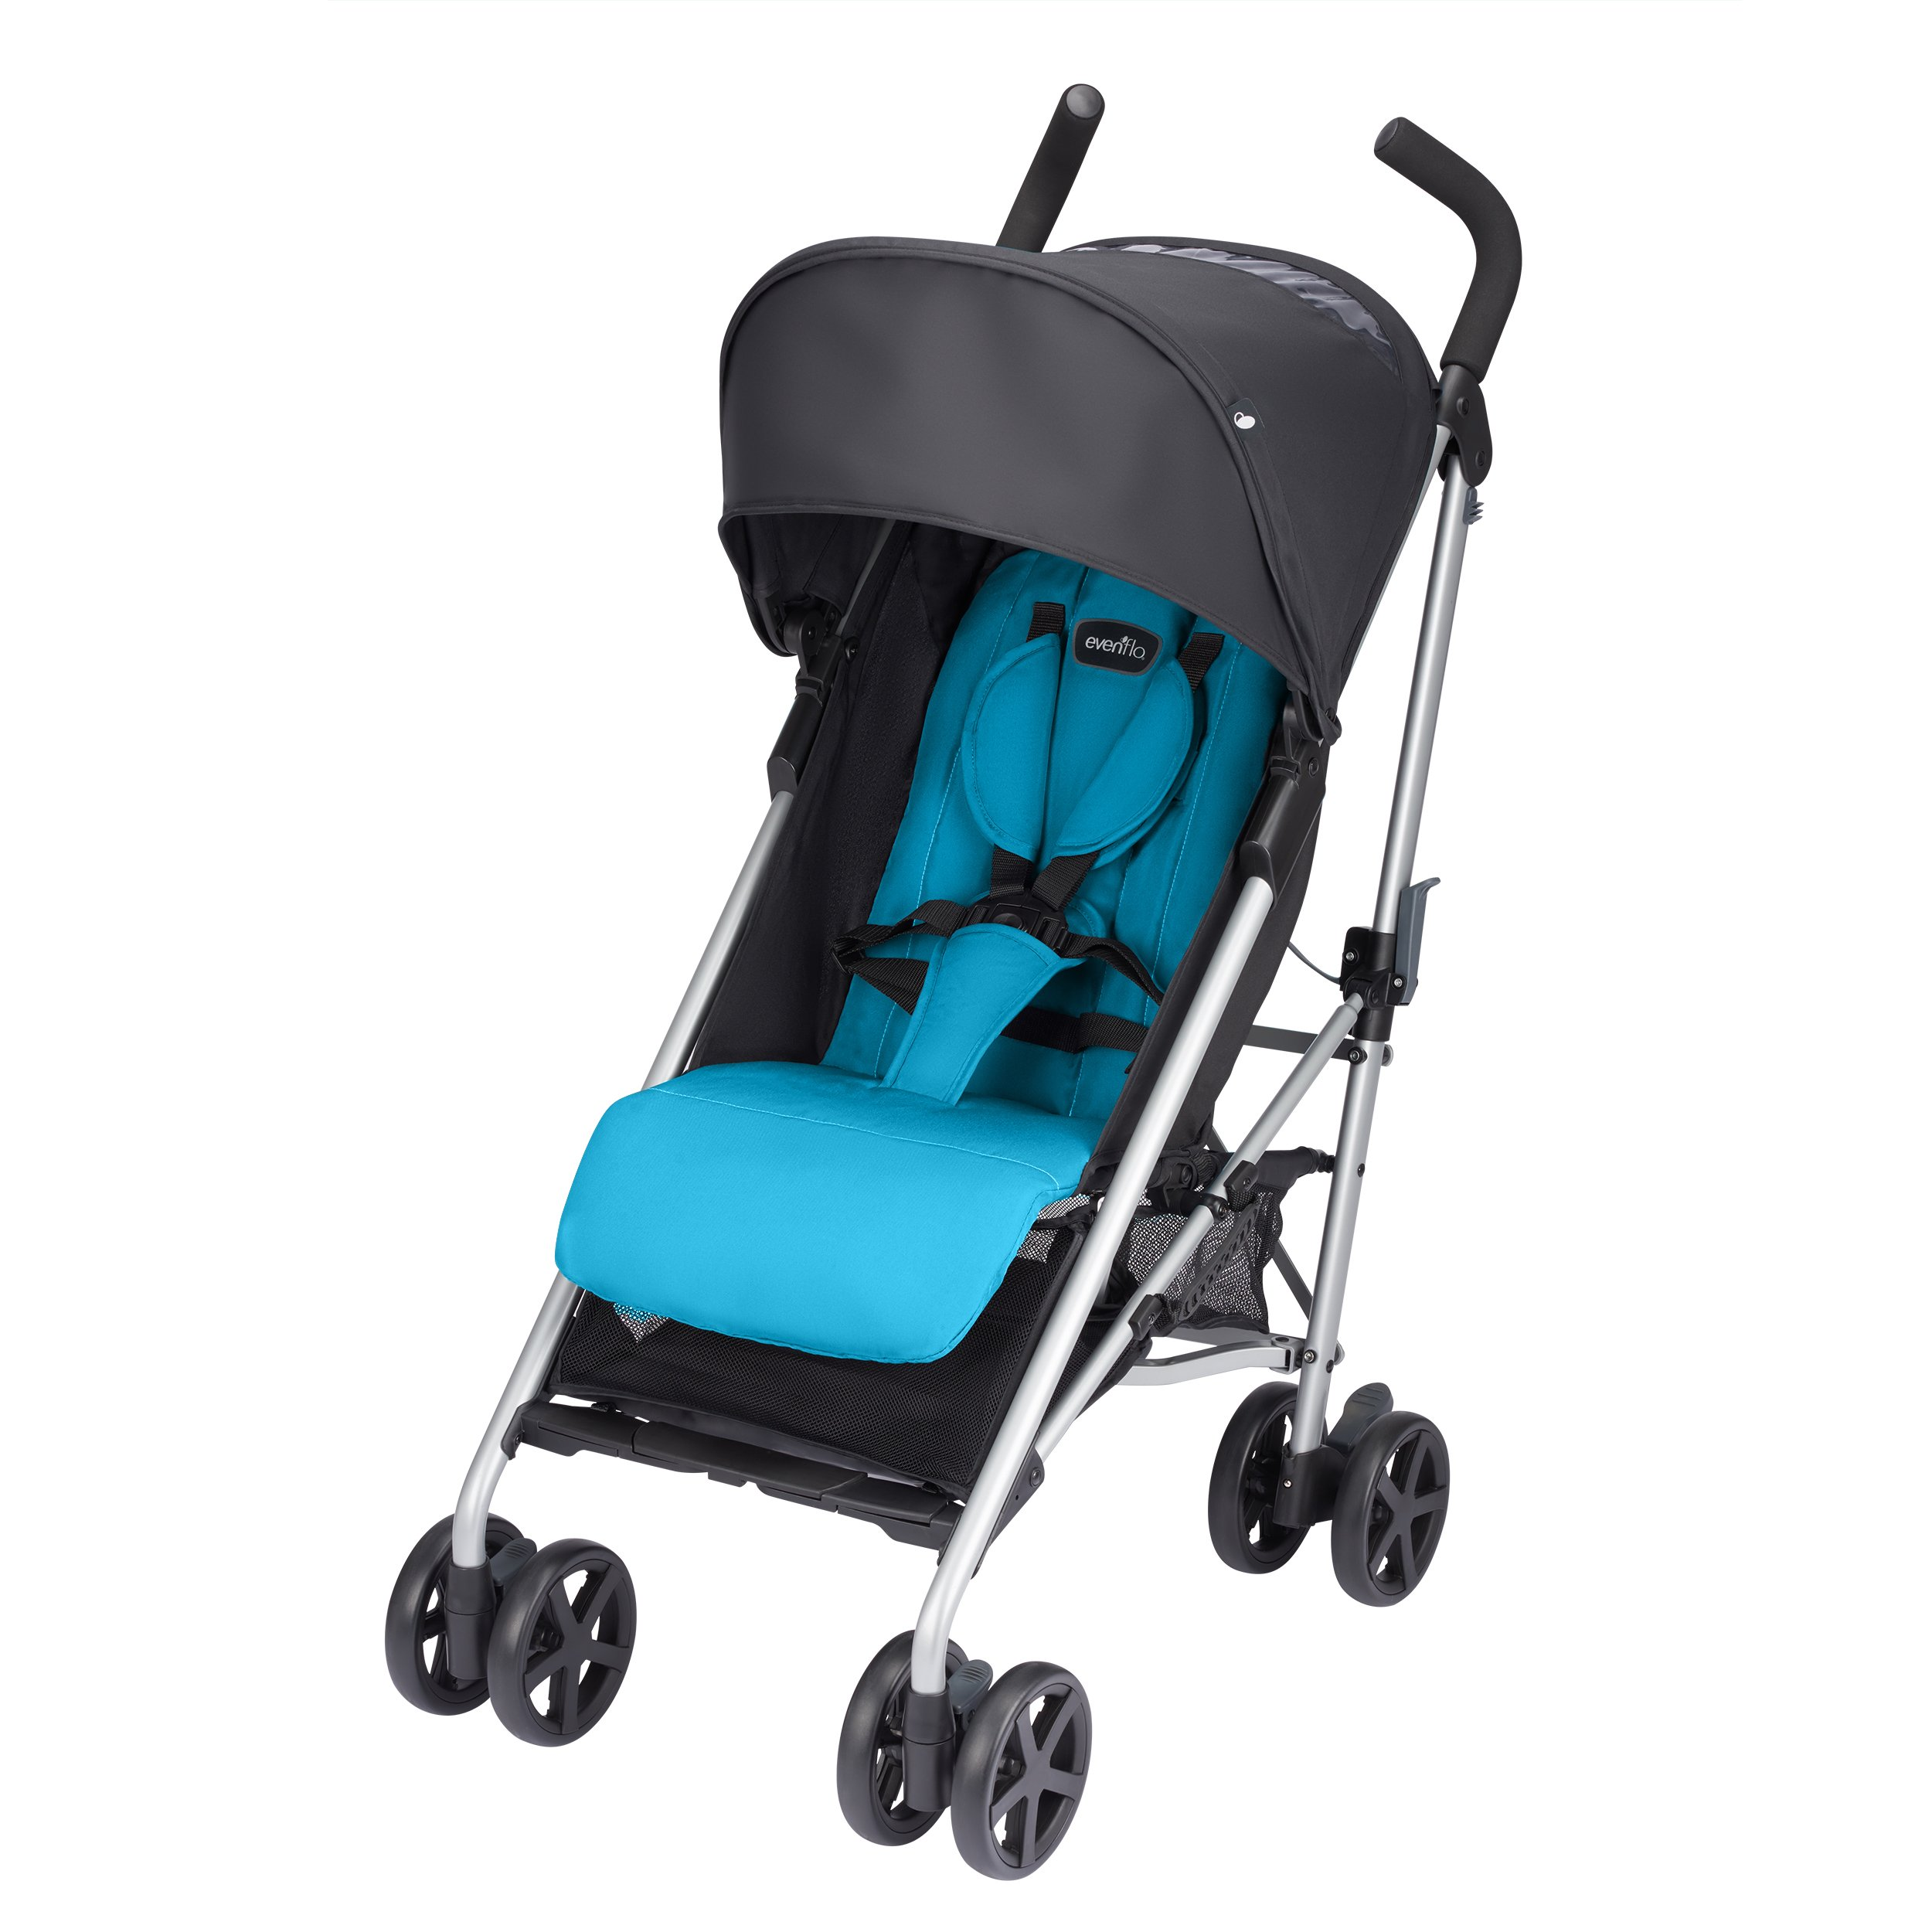 Evenflo Minno Lightweight Stroller, Seashore Blue